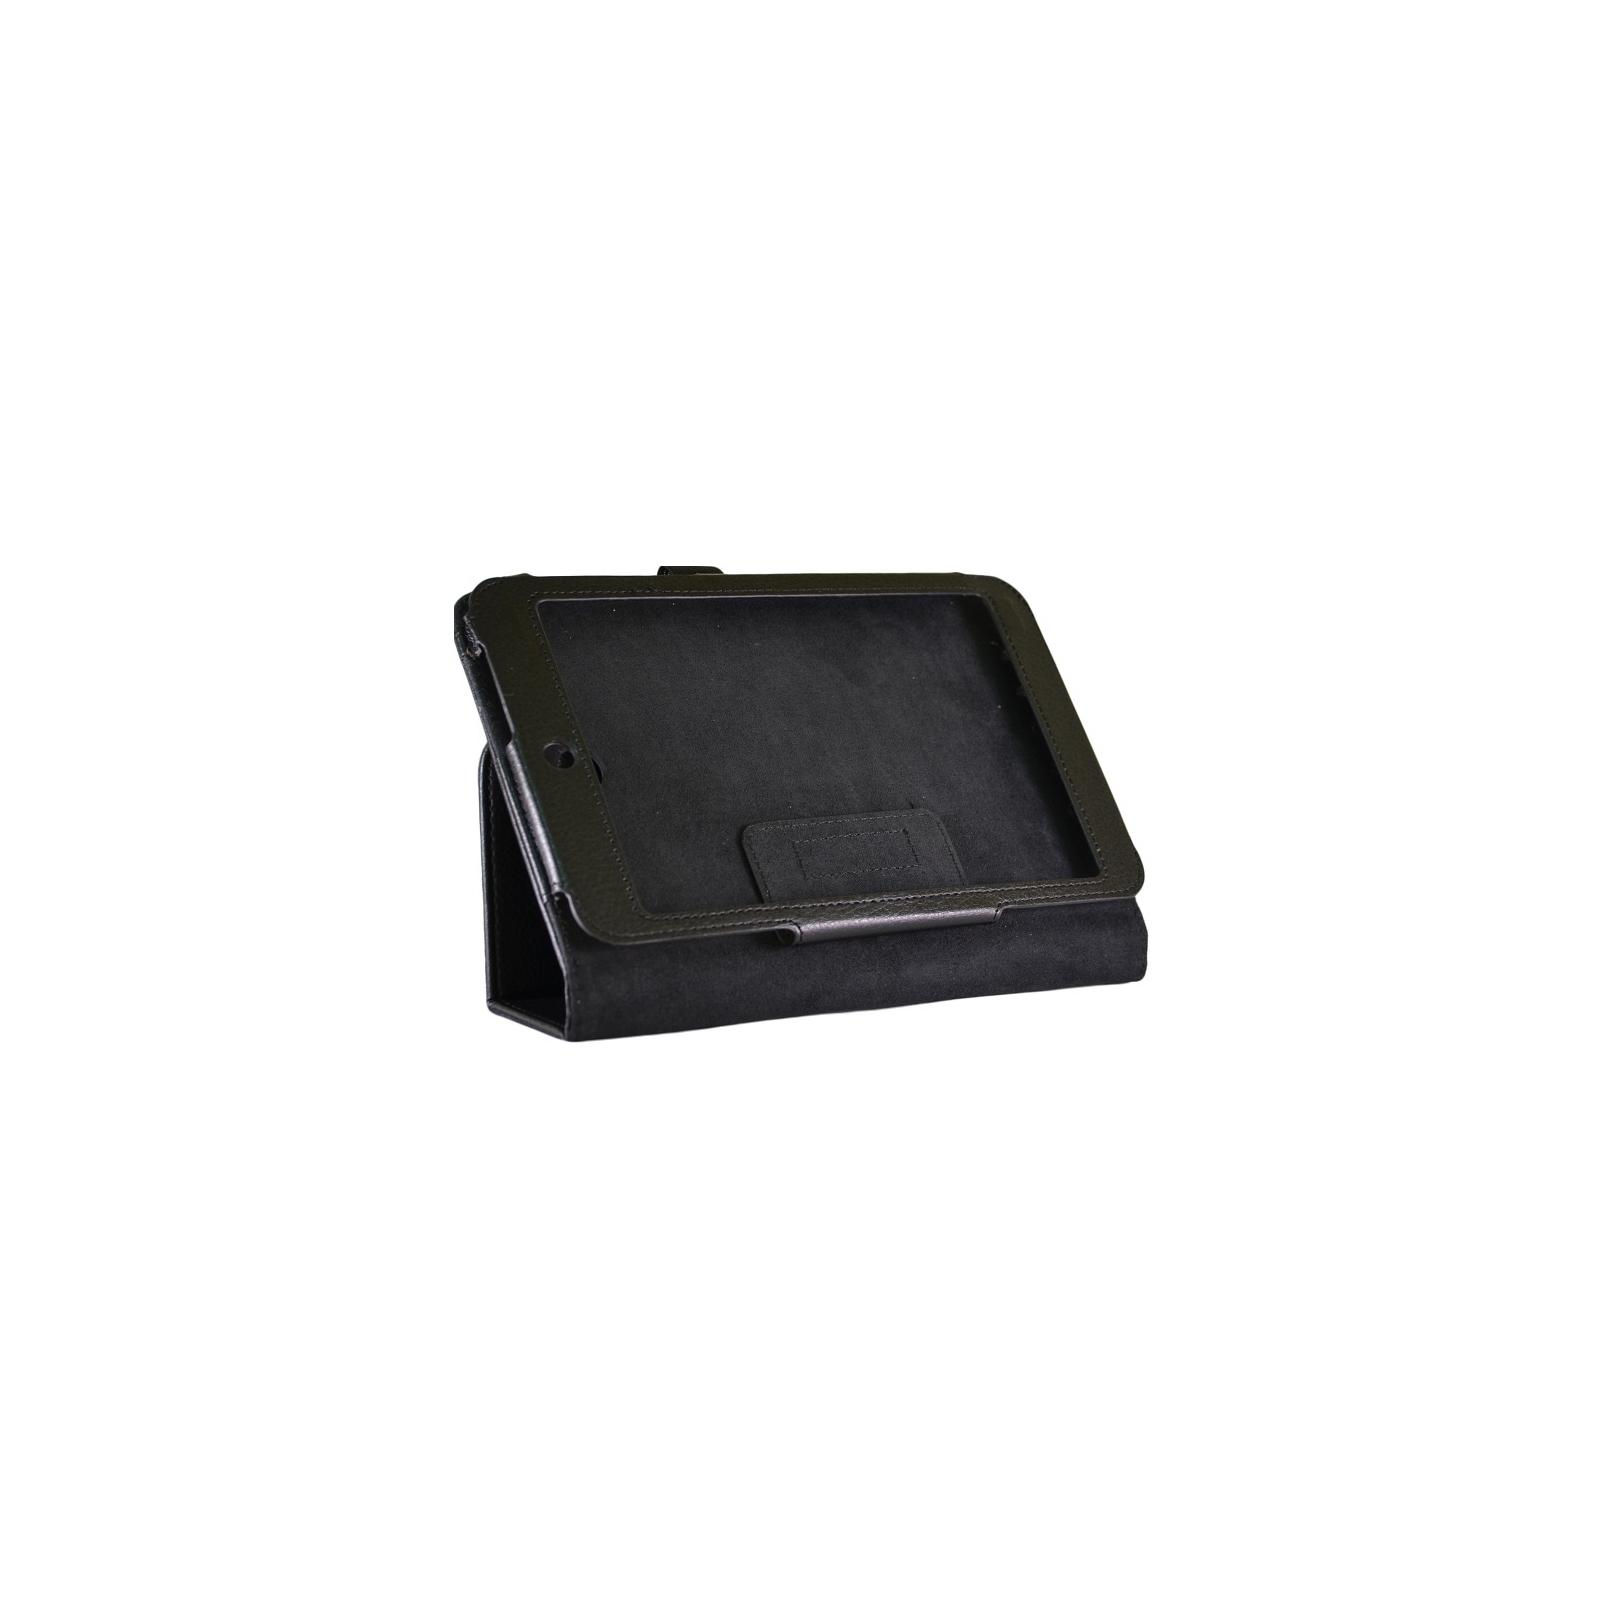 "Чехол для планшета Pro-case 7"" Pro-case Asus Memo Pad ME173 7"" (ME173 7"") изображение 4"